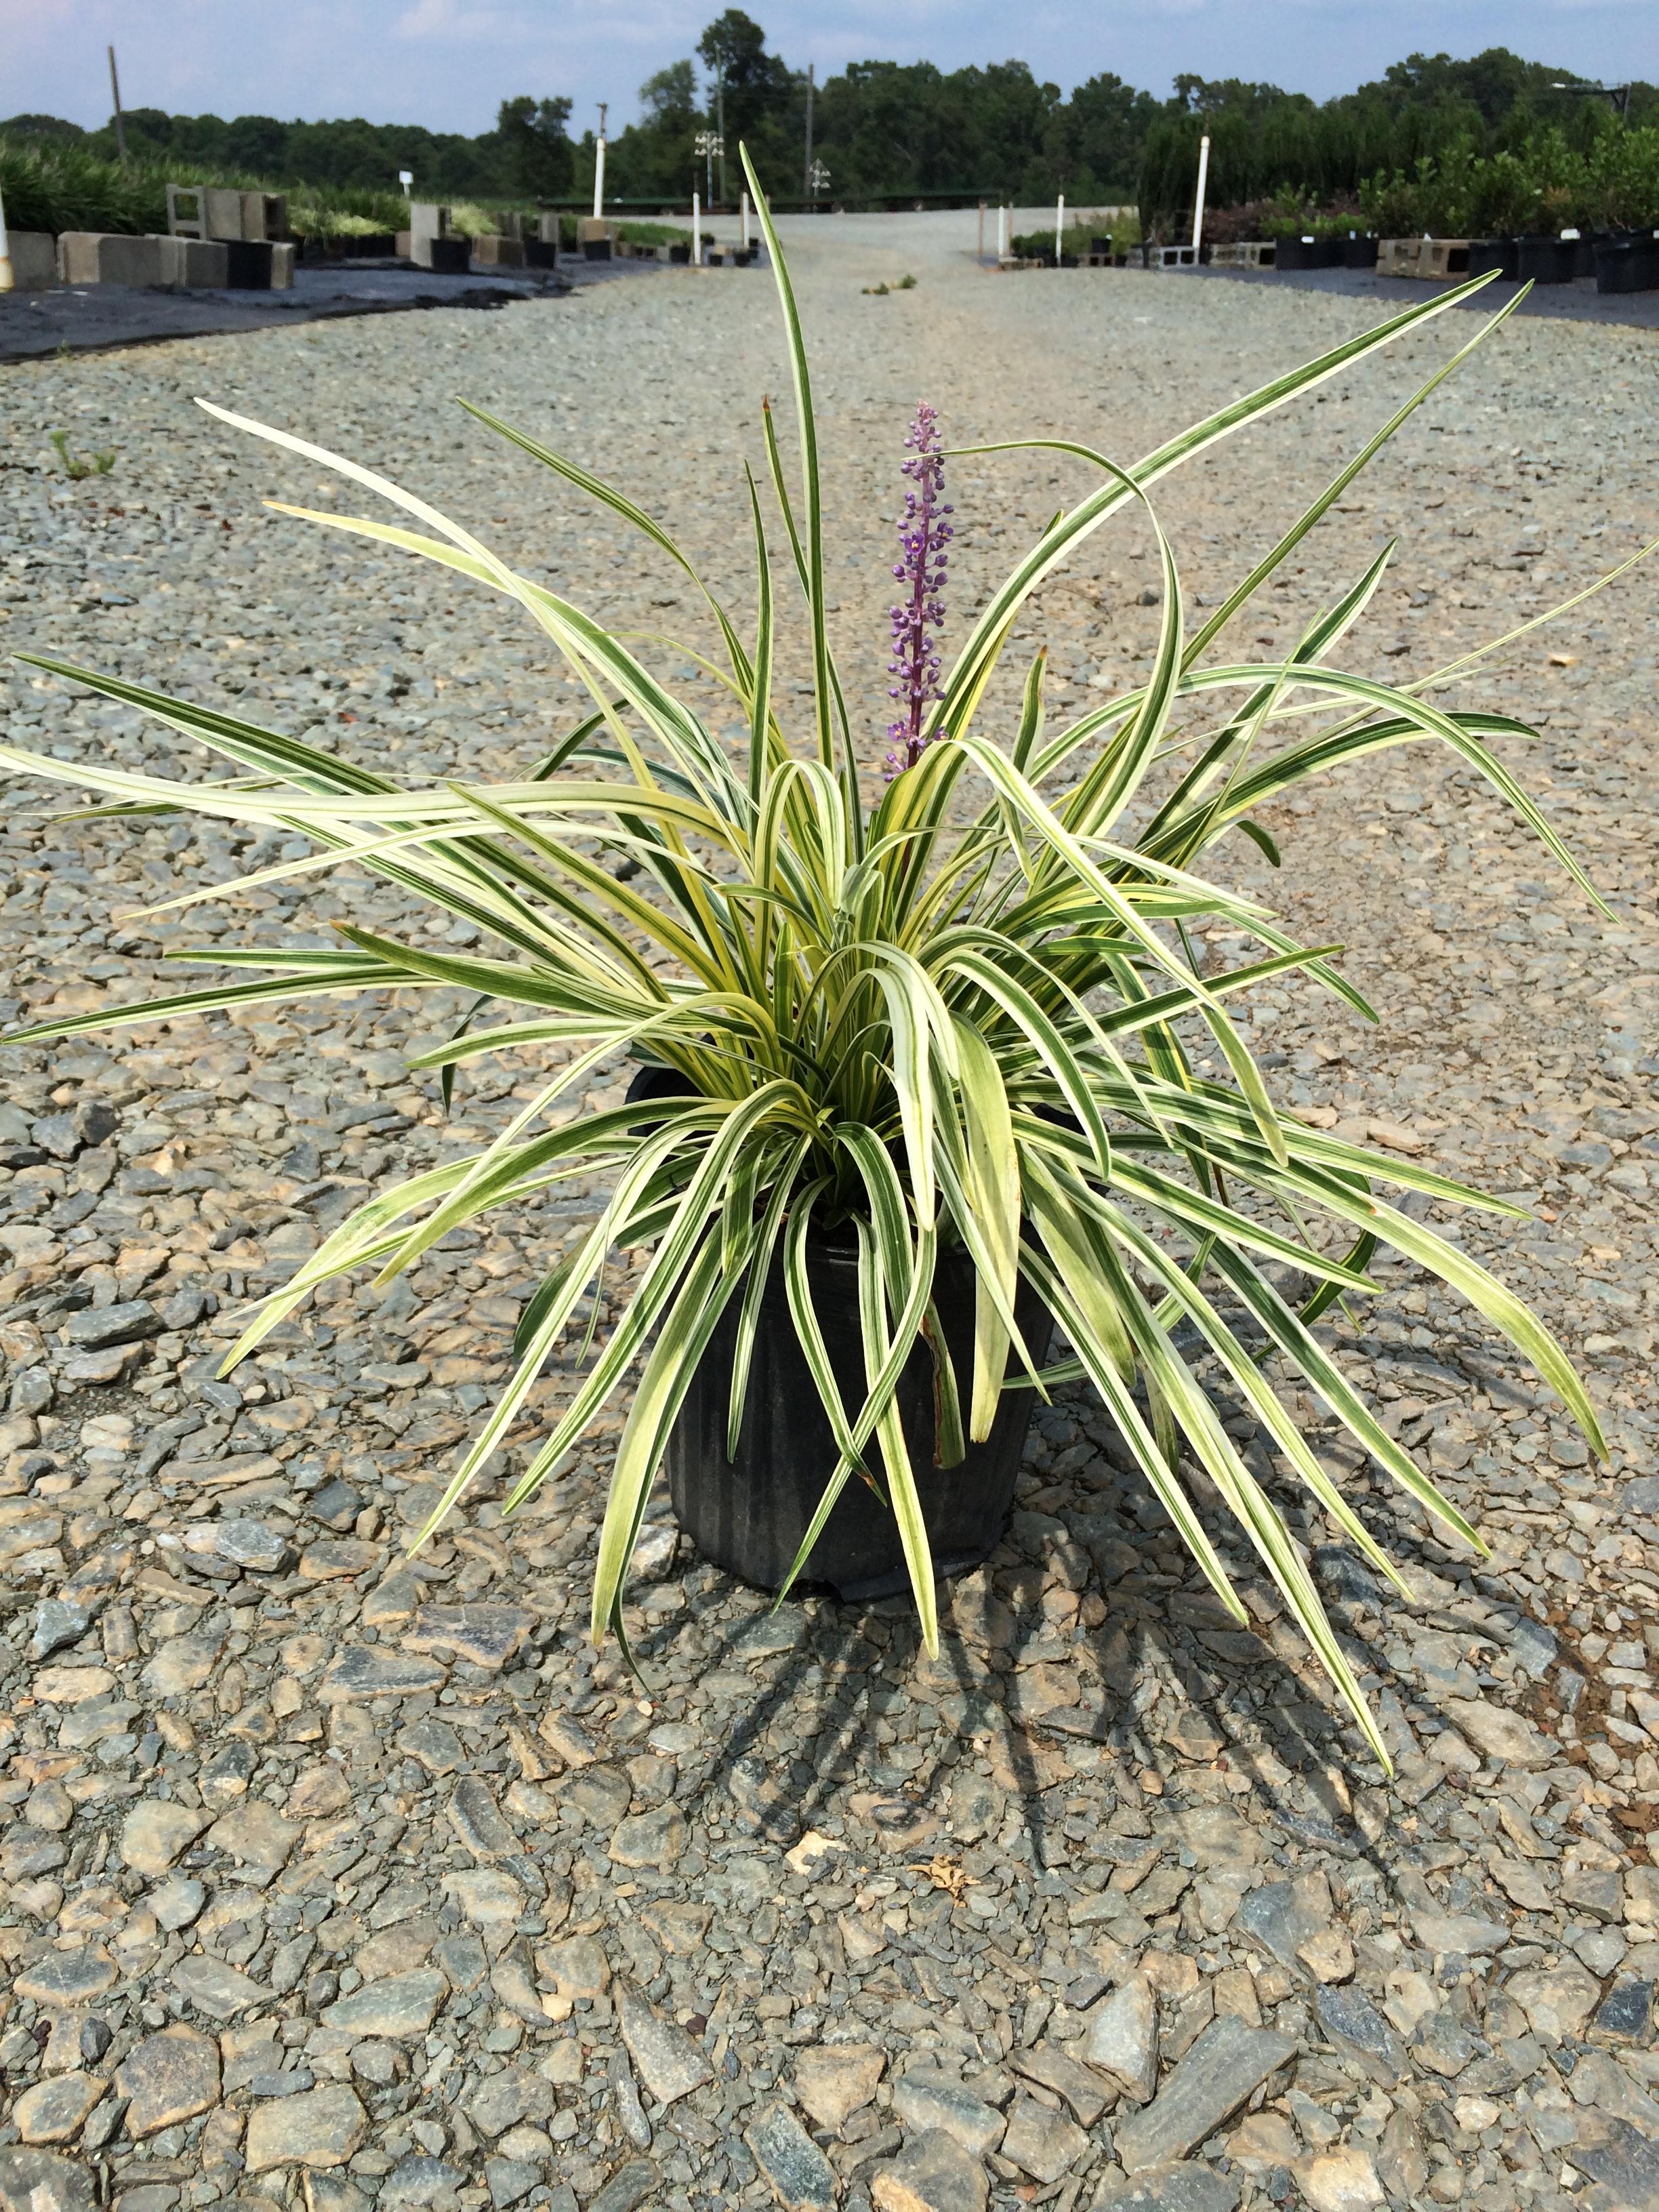 Lilyturf silvery sunproof 1g liriope muscari silvery sunproof lilyturf silvery sunproof 1g liriope muscari silvery sunproof mightylinksfo